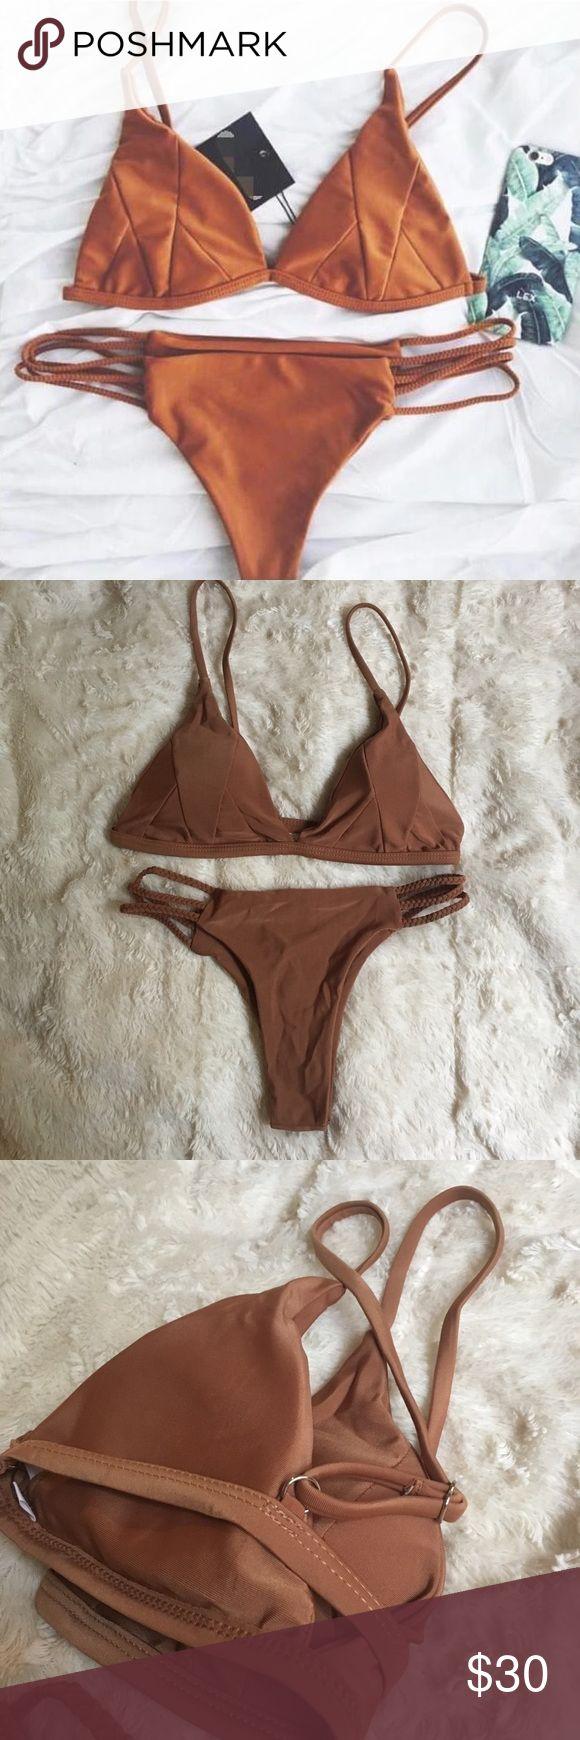 Brazilian triangle bikini Brand new Brazilian triangle bikini with no tags. Size medium. Has padding and adjustable straps! Swim Bikinis